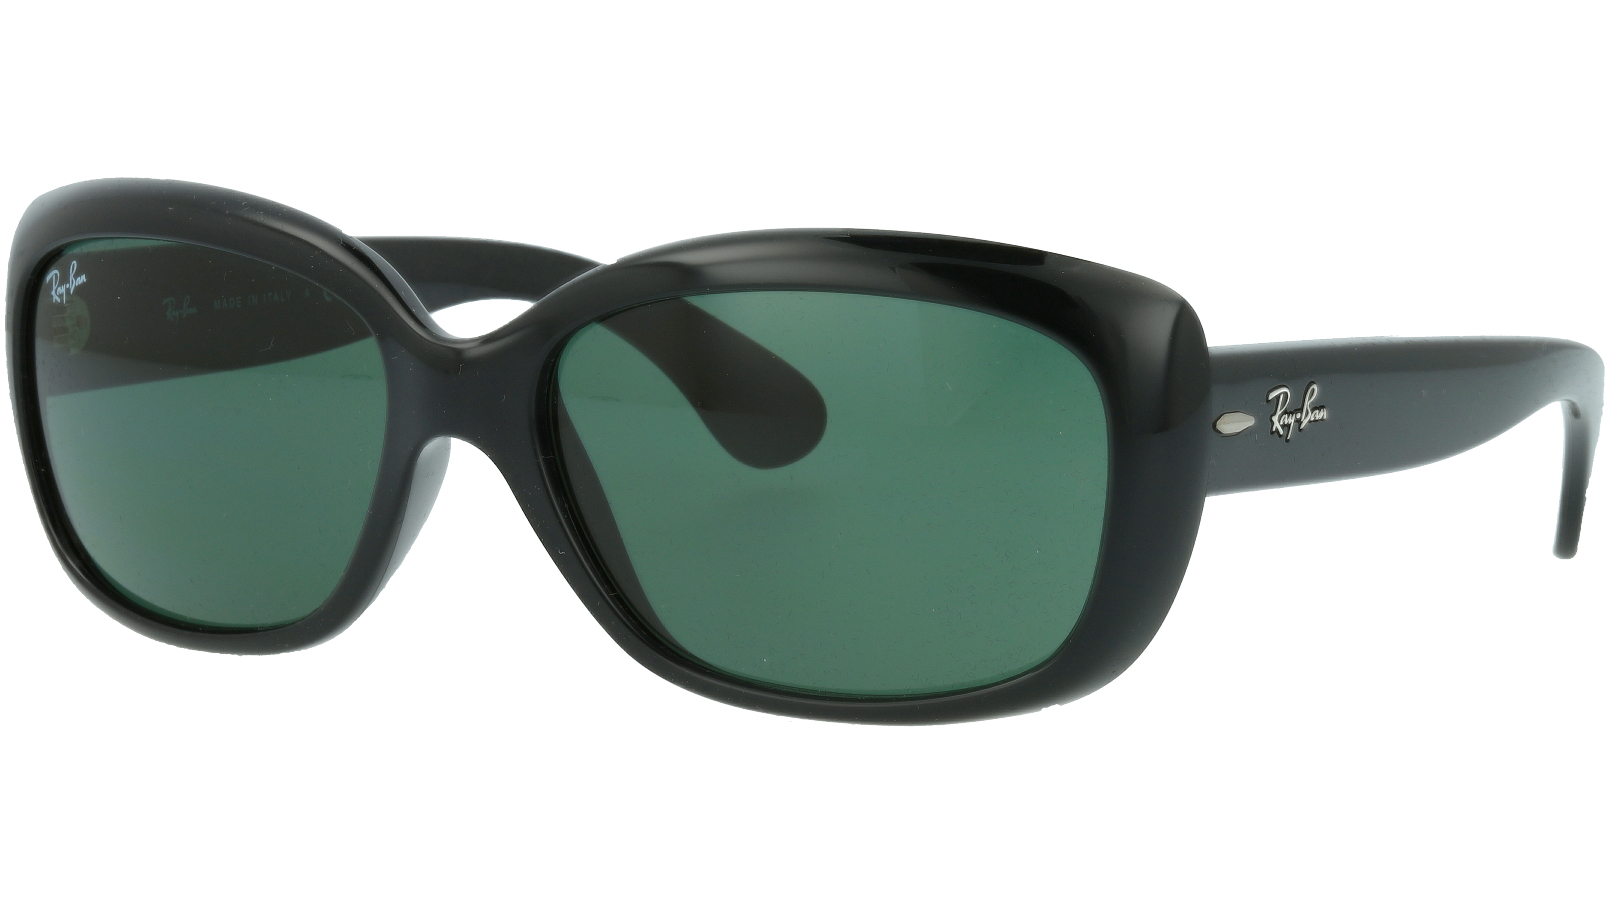 Ray-Ban RB4101 601 Black Sunglasses